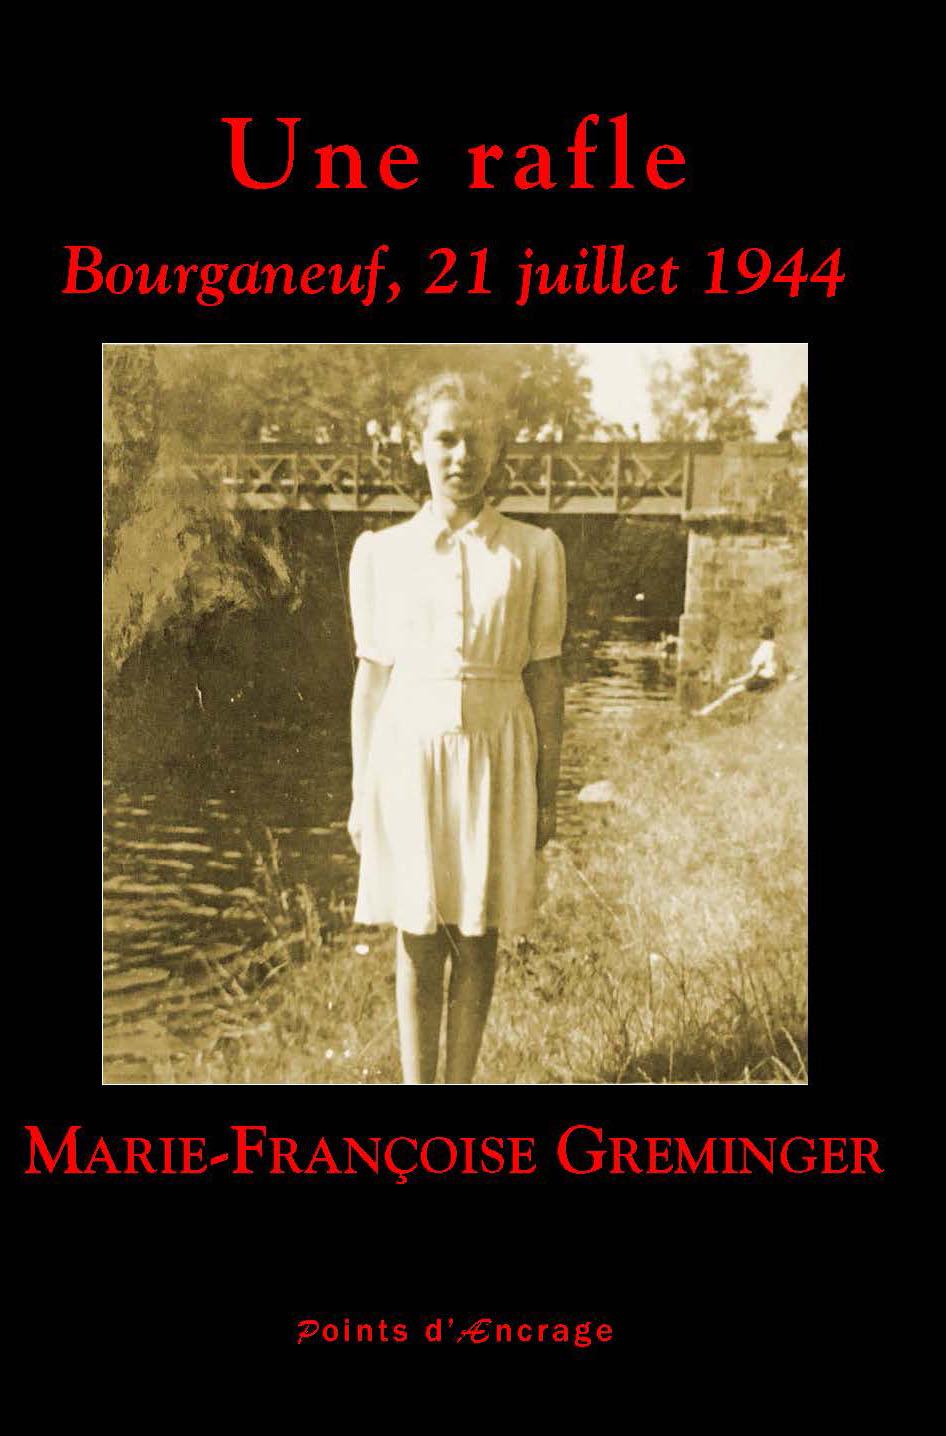 Une rafle Bourganeuf, 21 juillet 1944